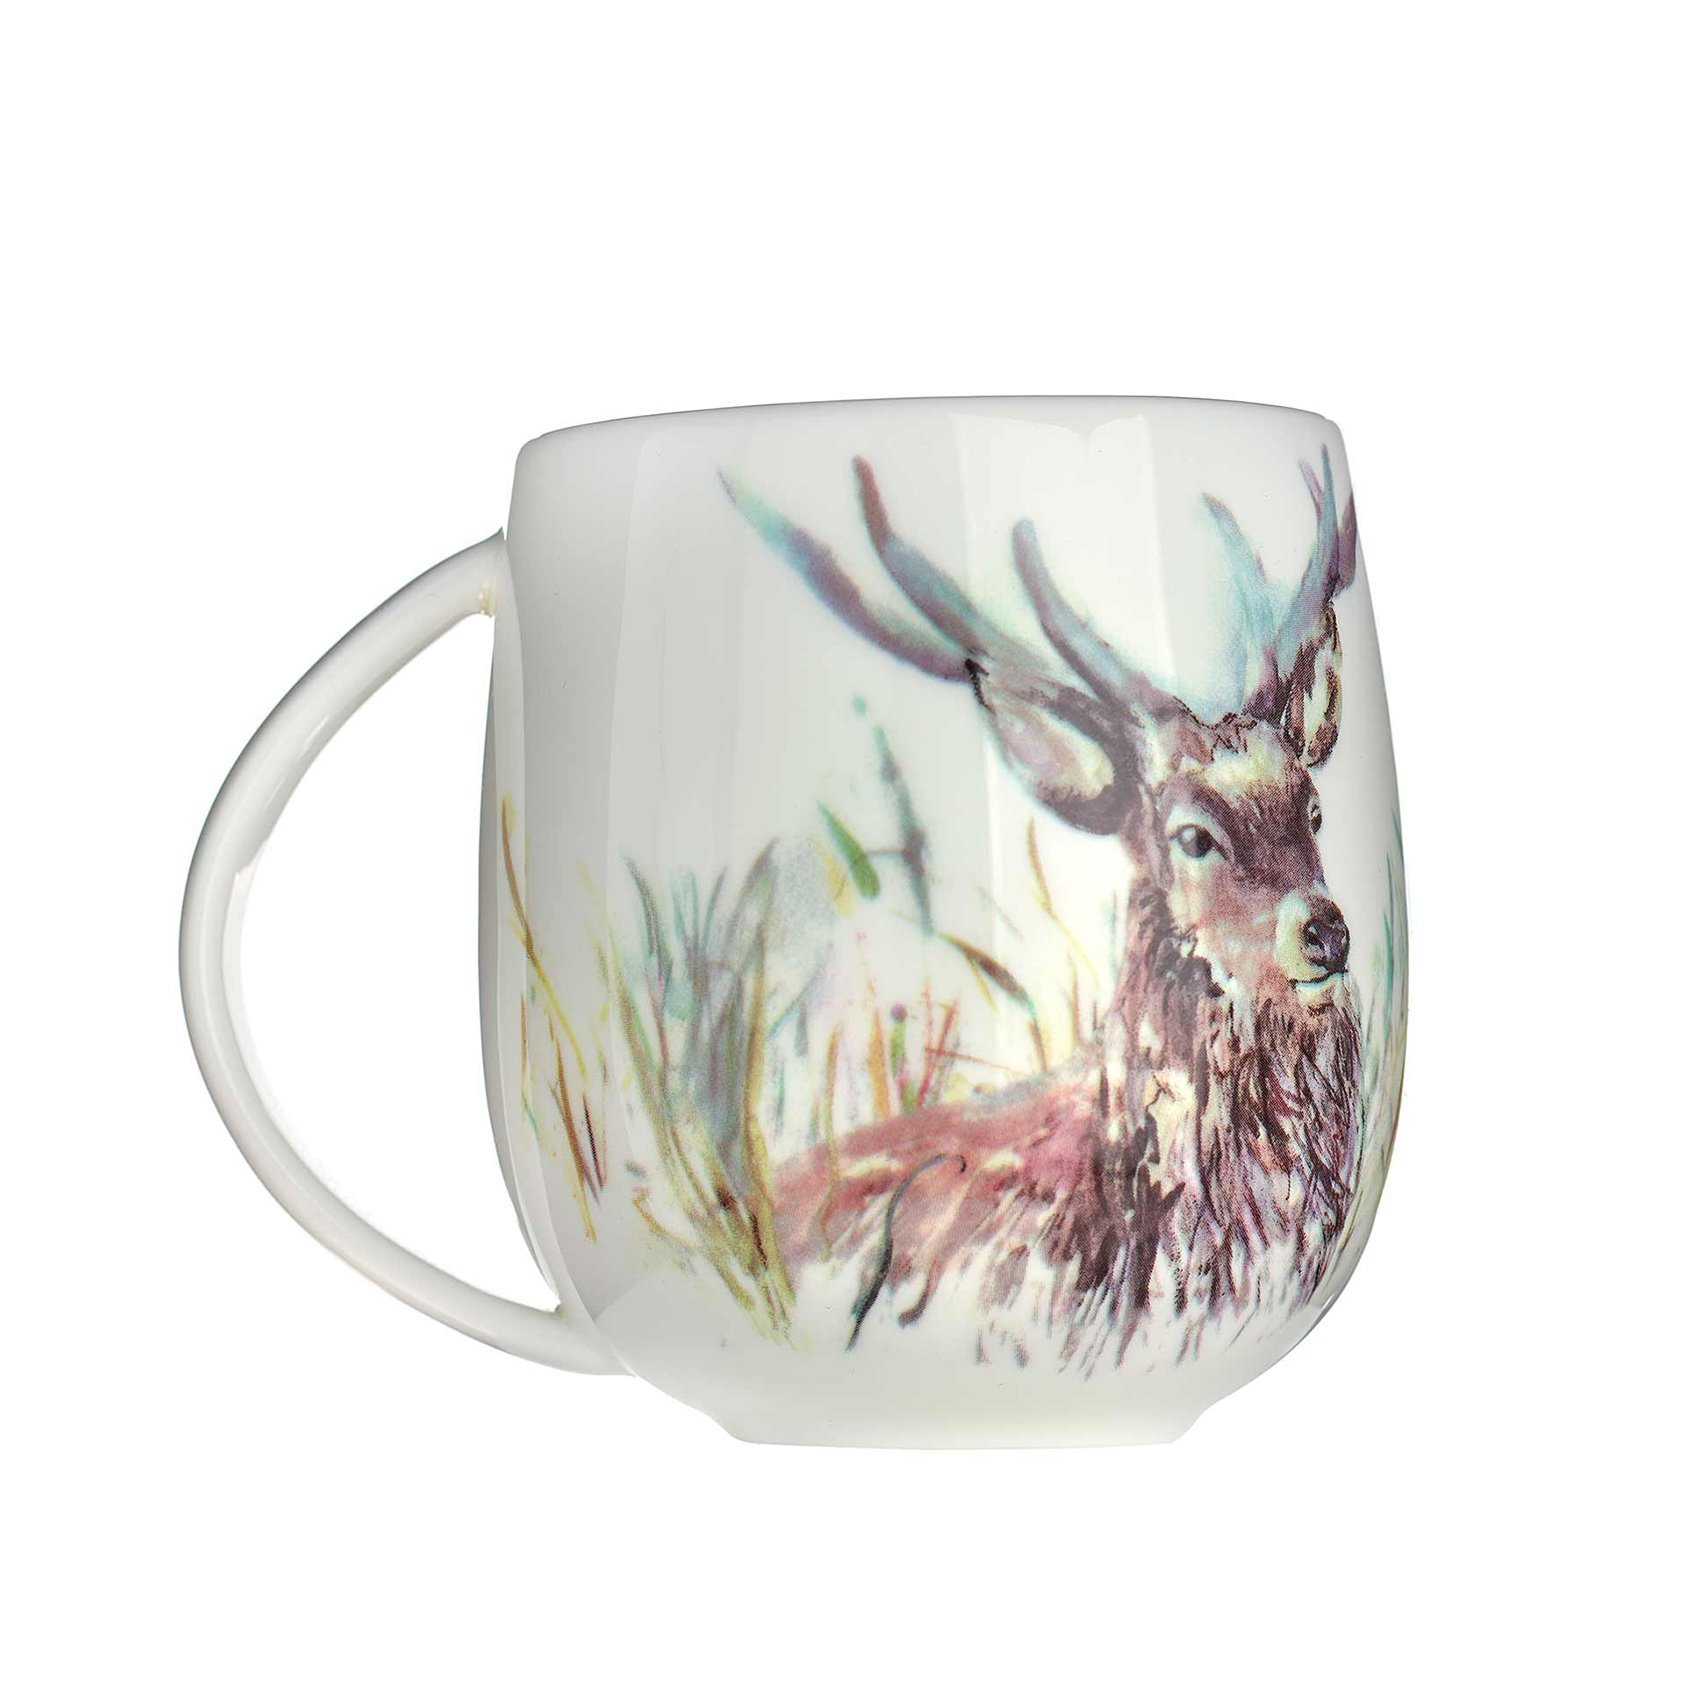 Voyage Stag Ceramic Mug